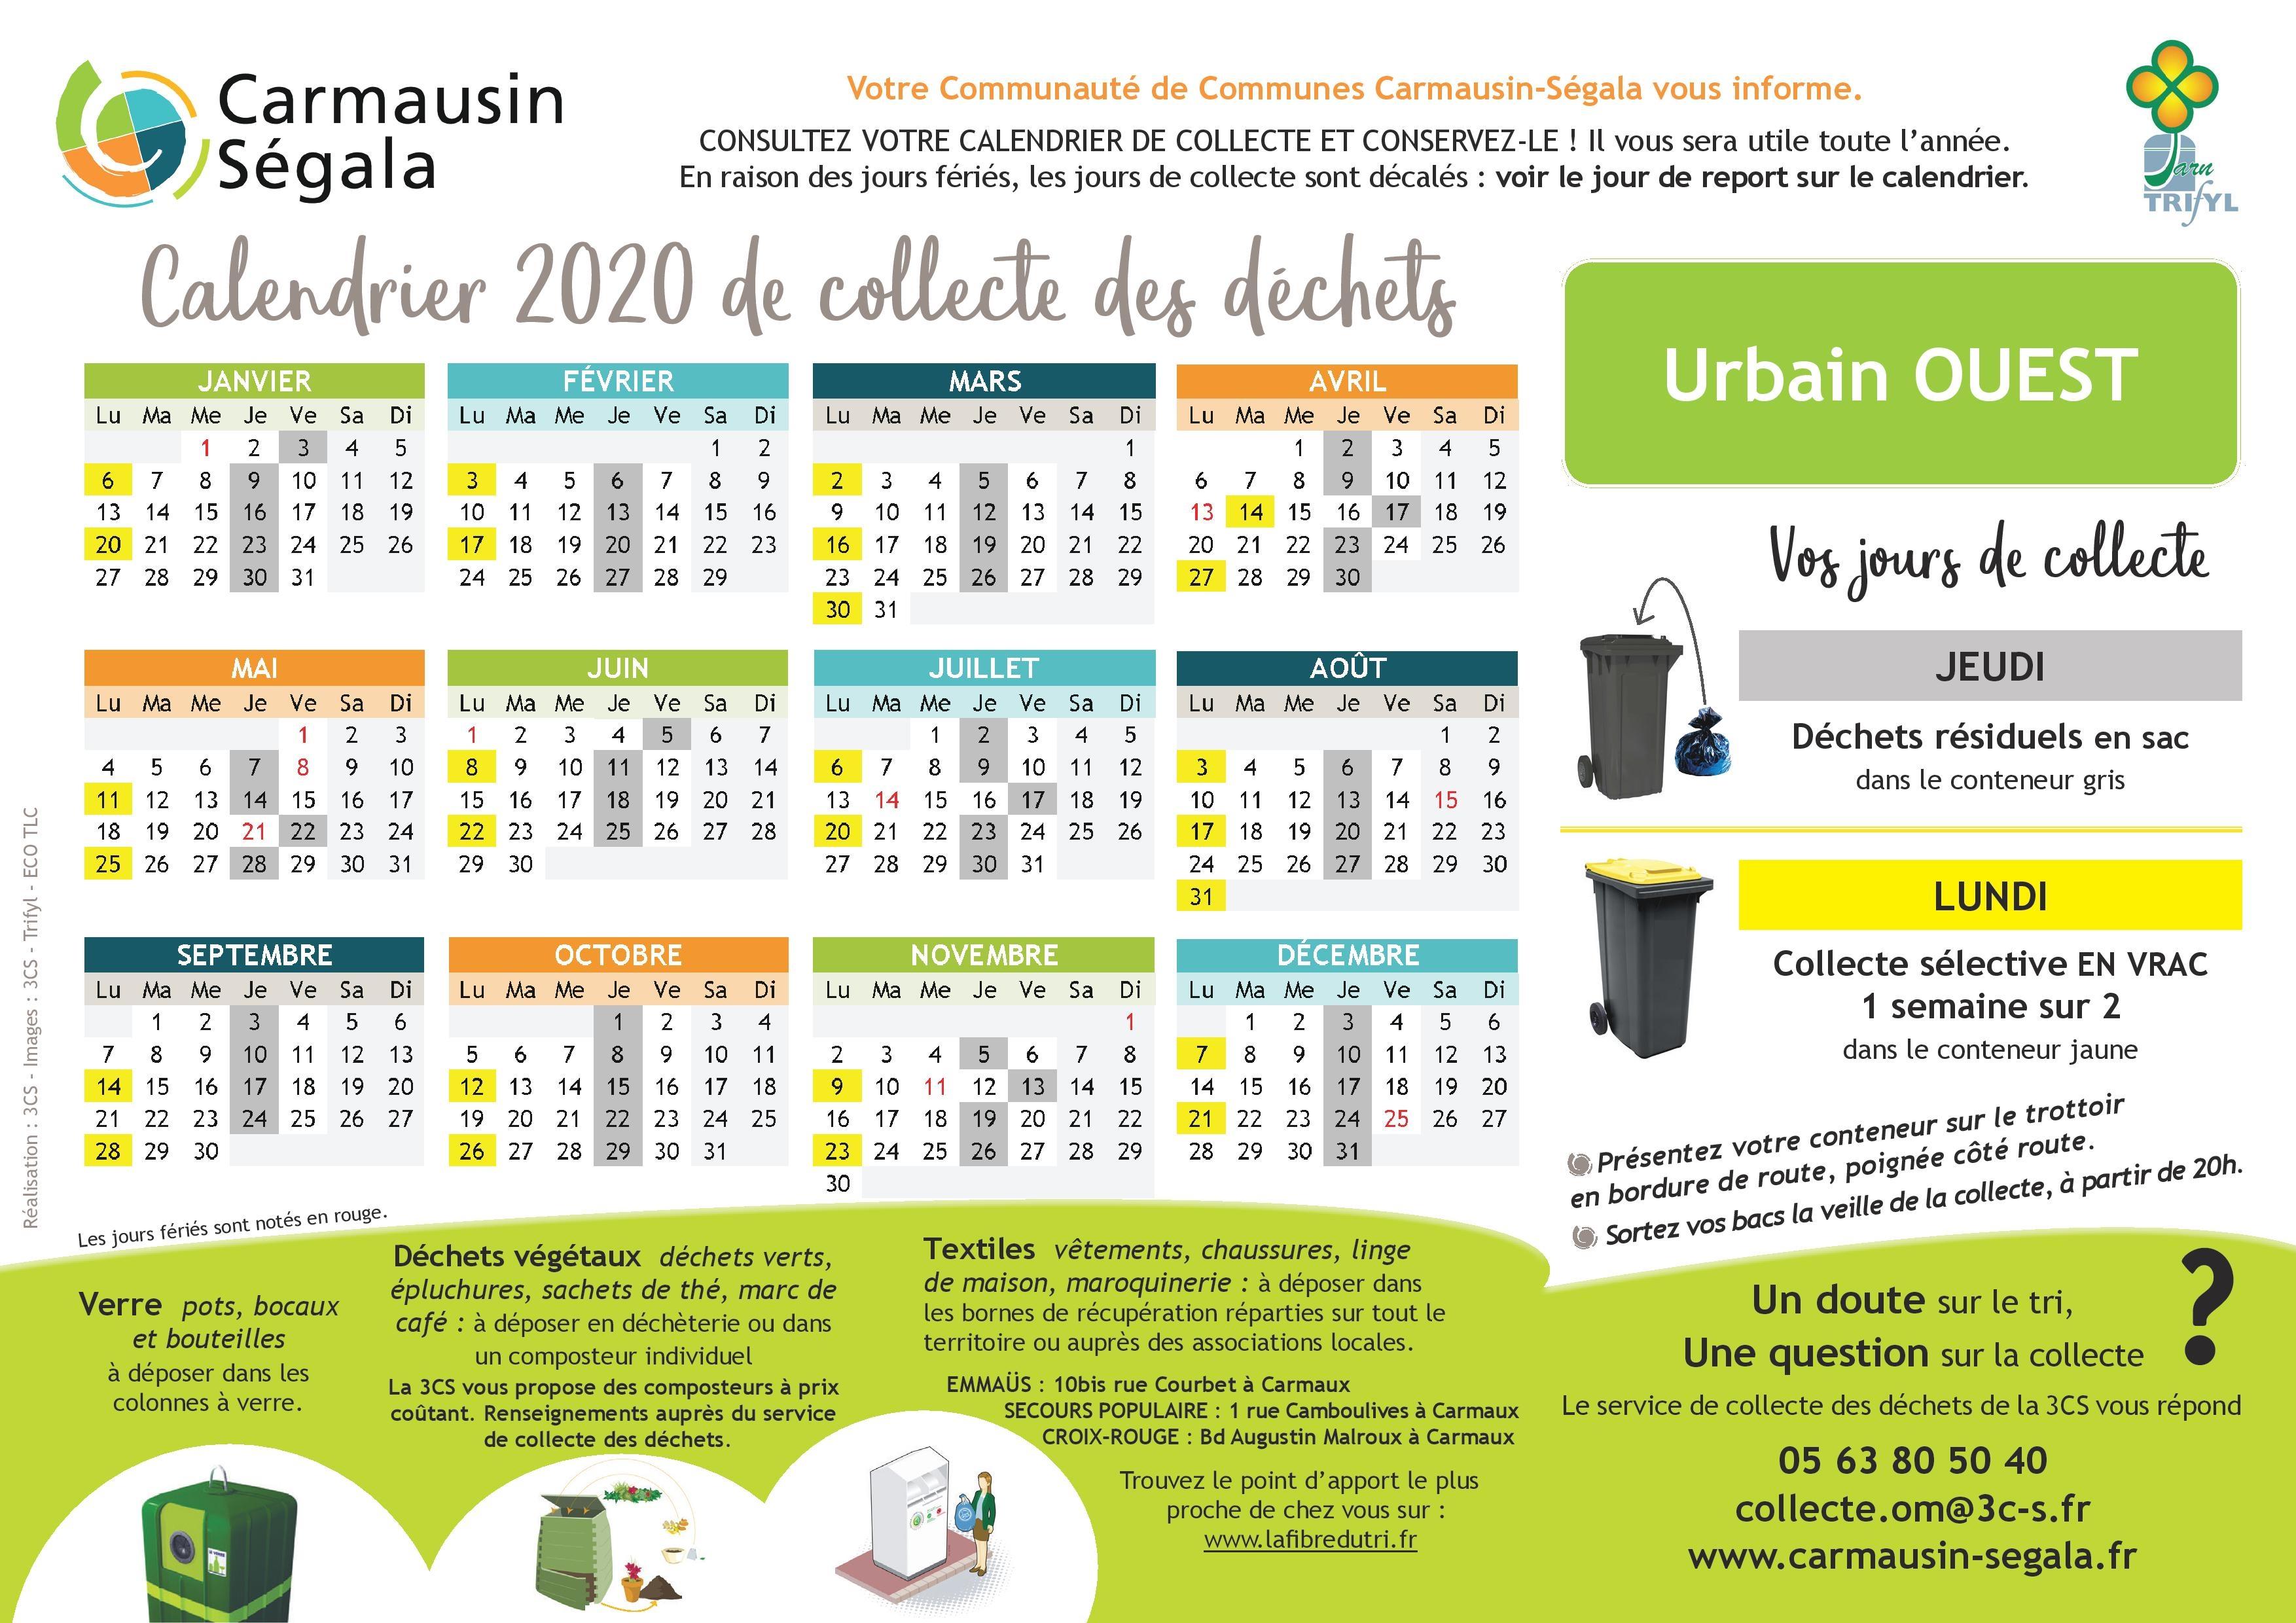 calendrier_om_2020_urbain_ouest.jpg